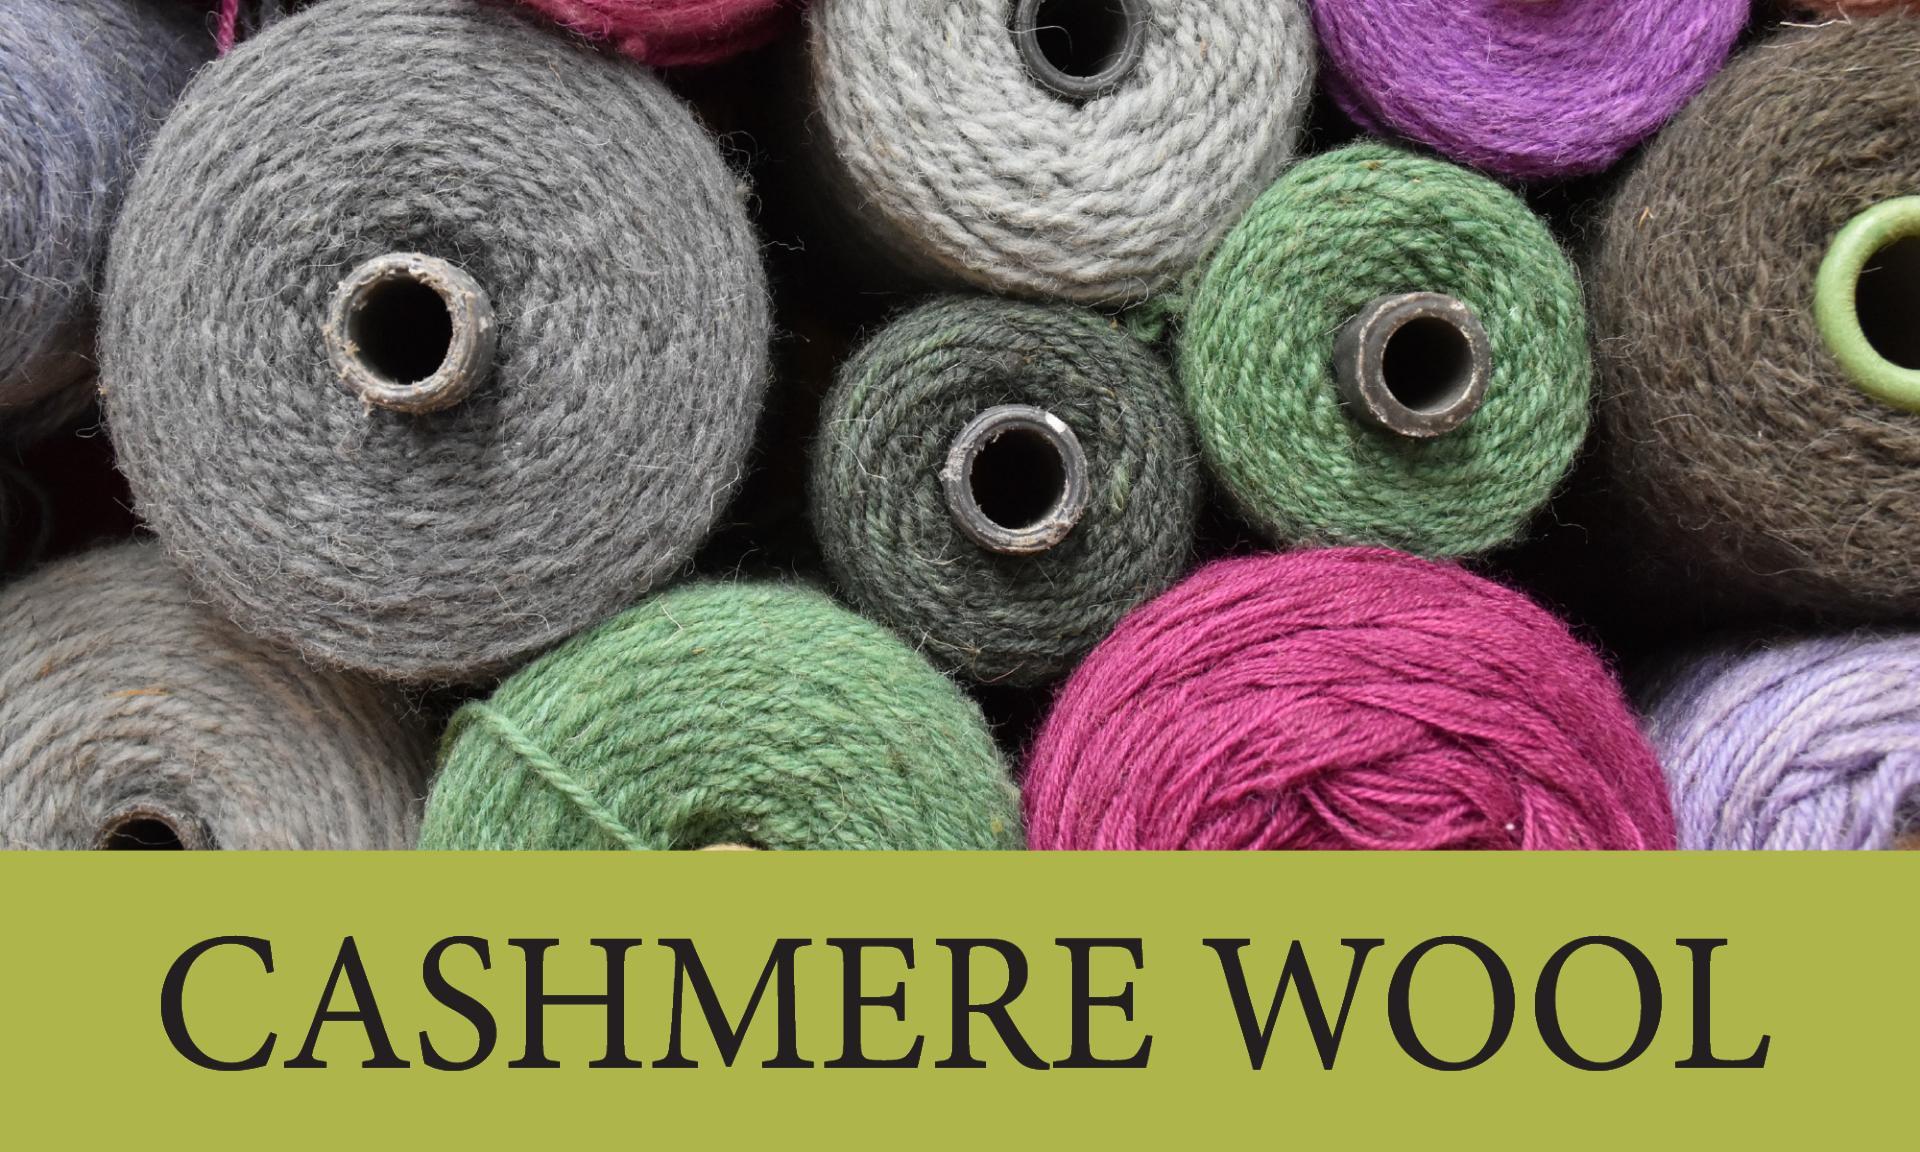 Cashmere Wool Blend Yarn